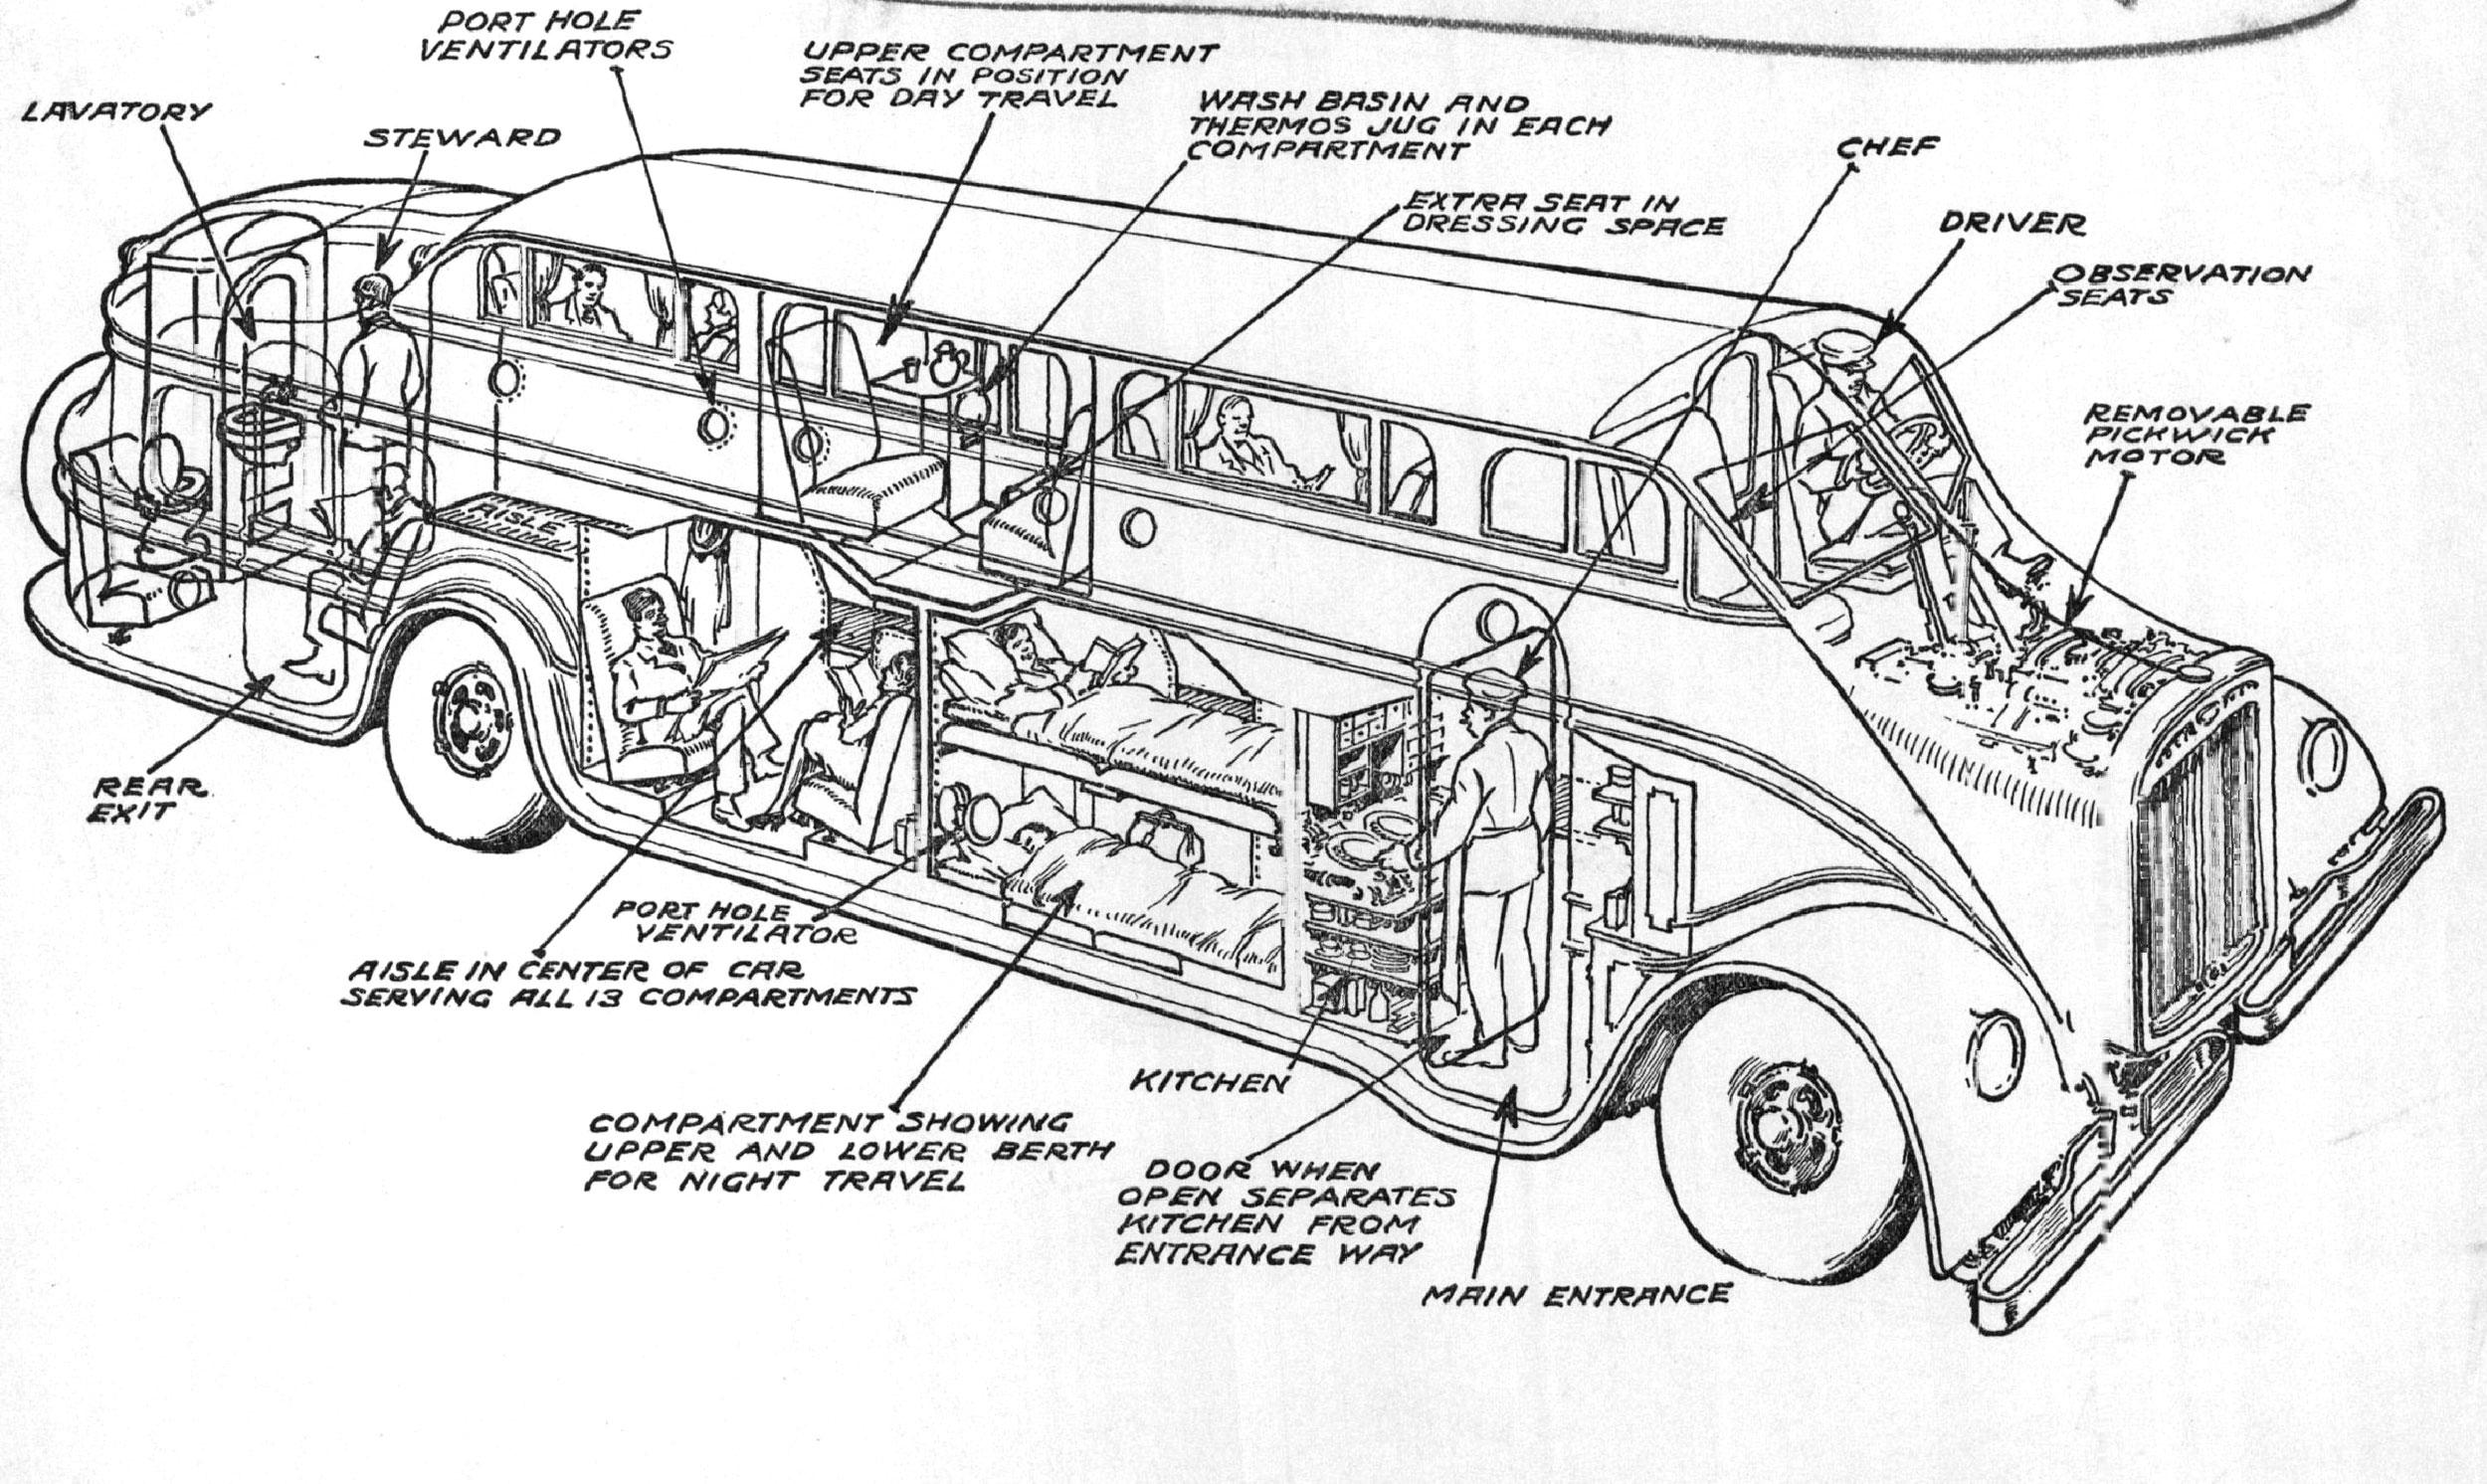 engine bay diagram of 2006 mustang